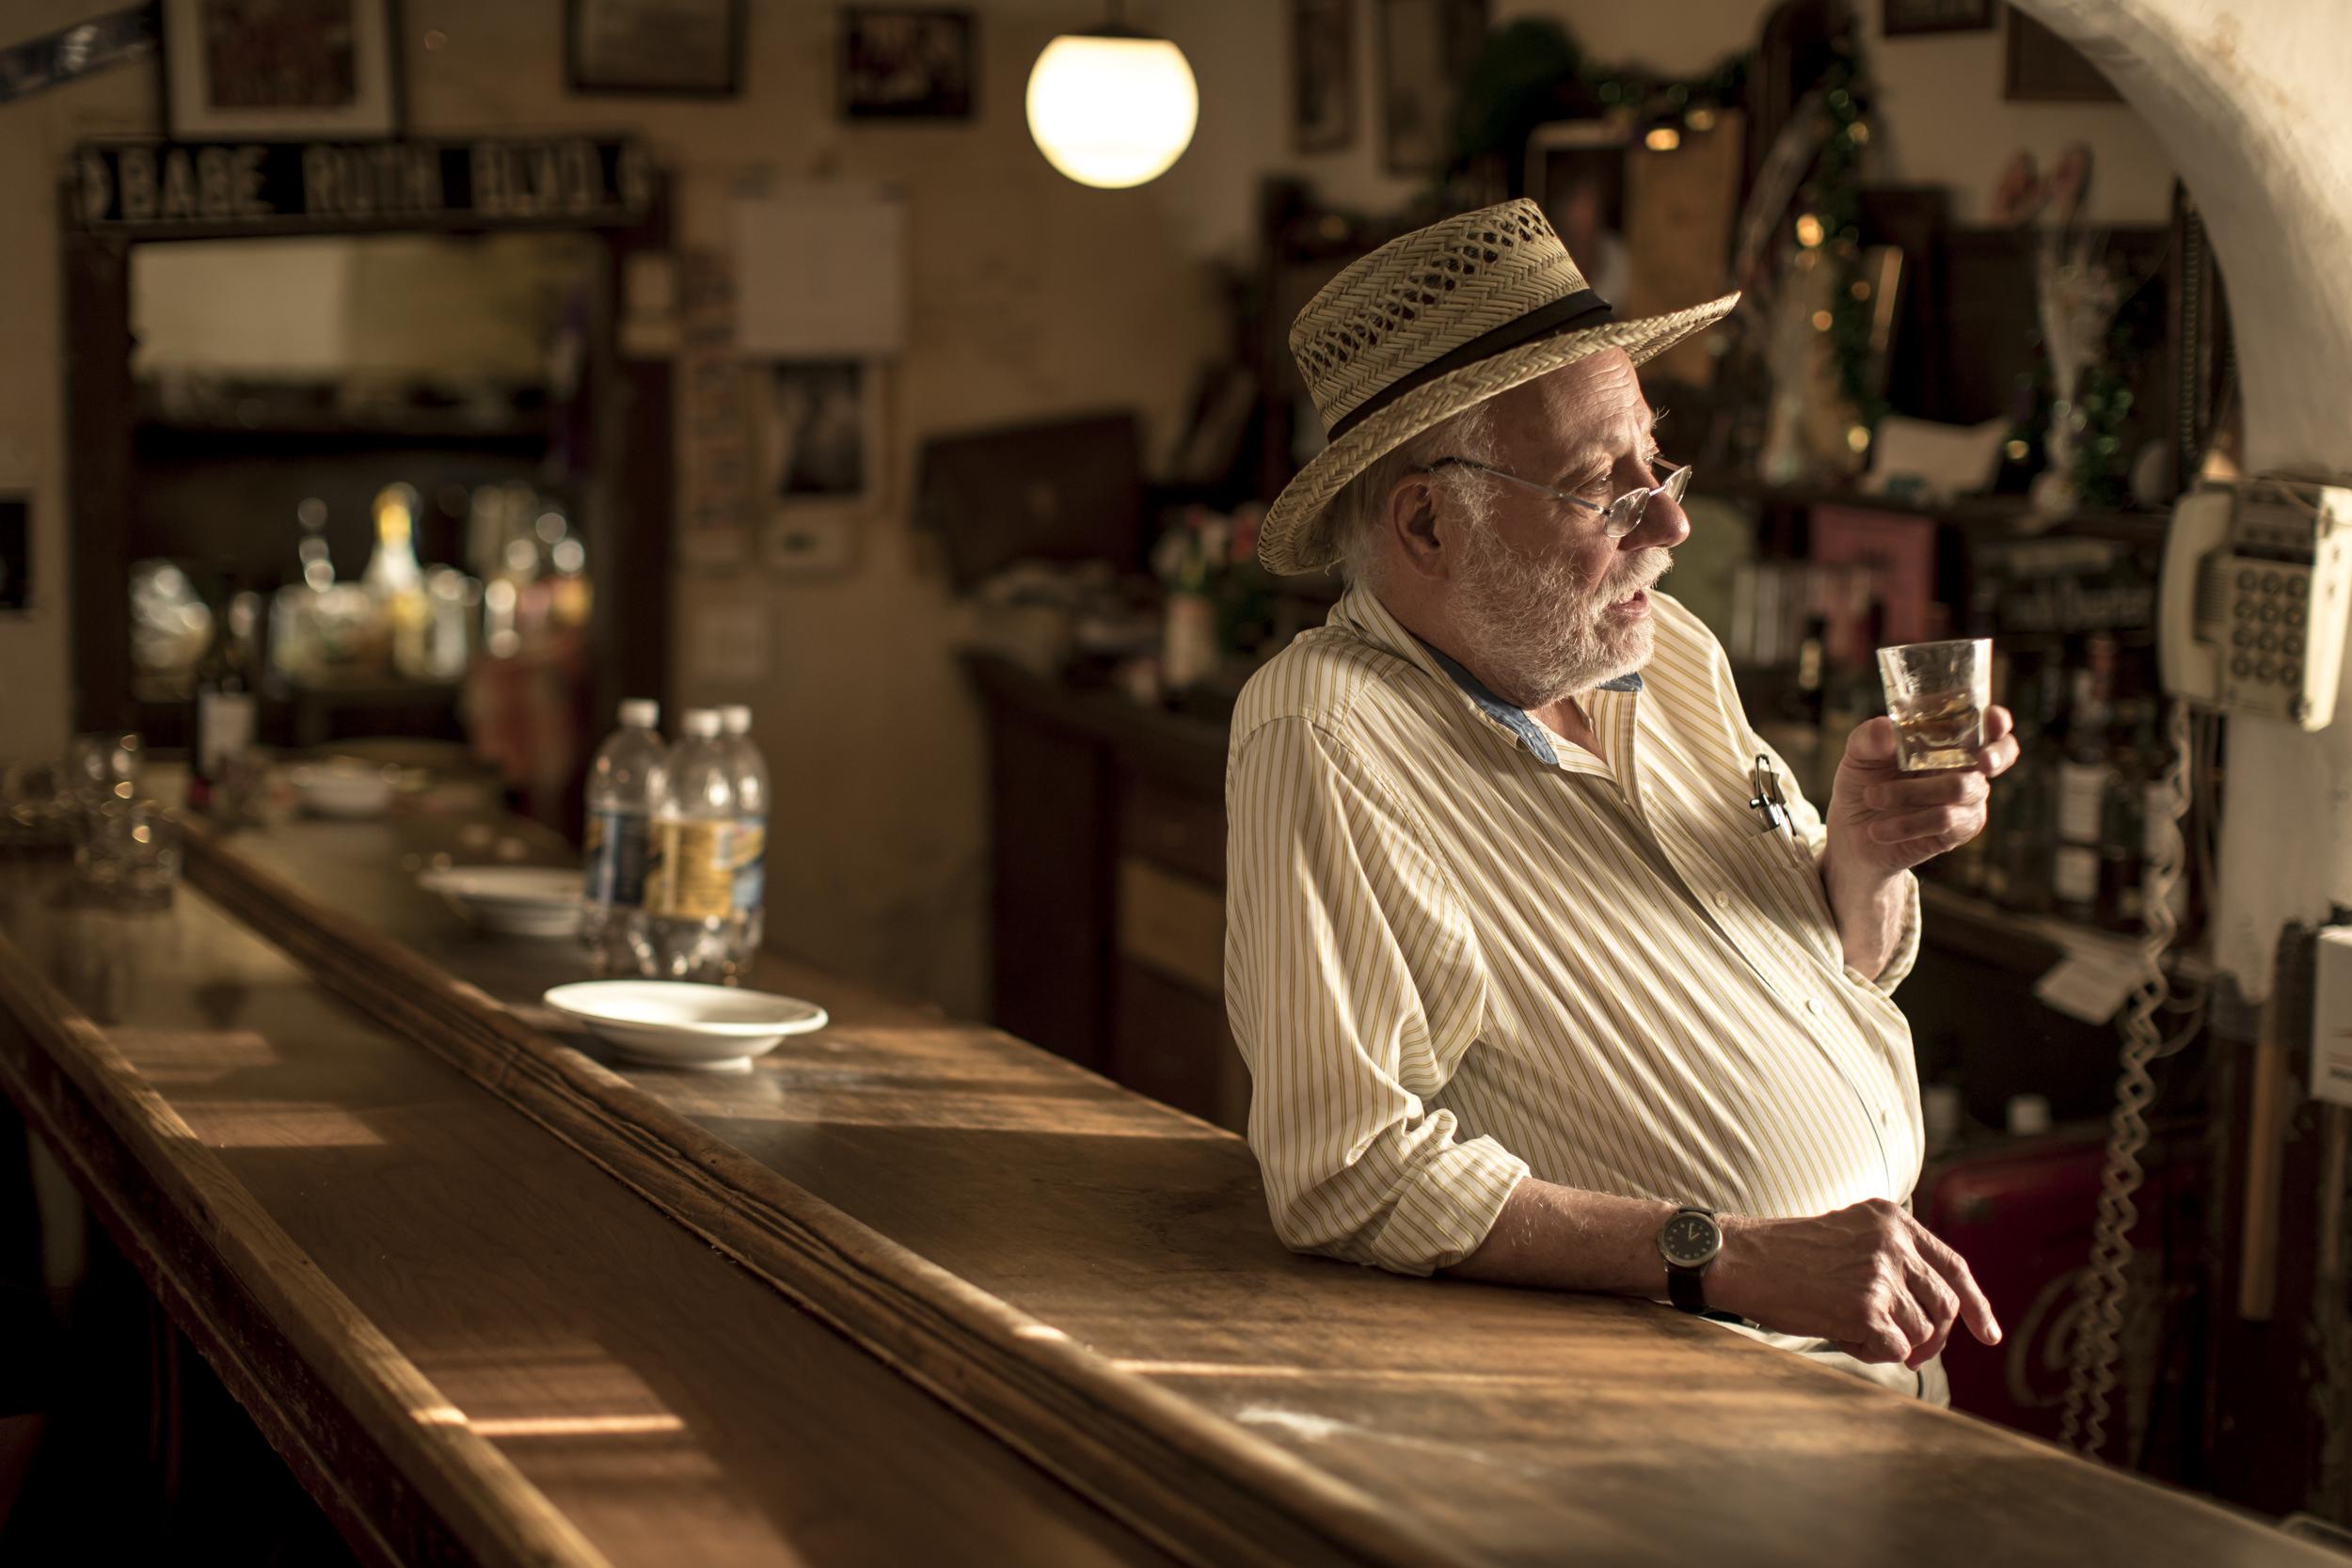 Ron Gurdjian of Tom's Tavern